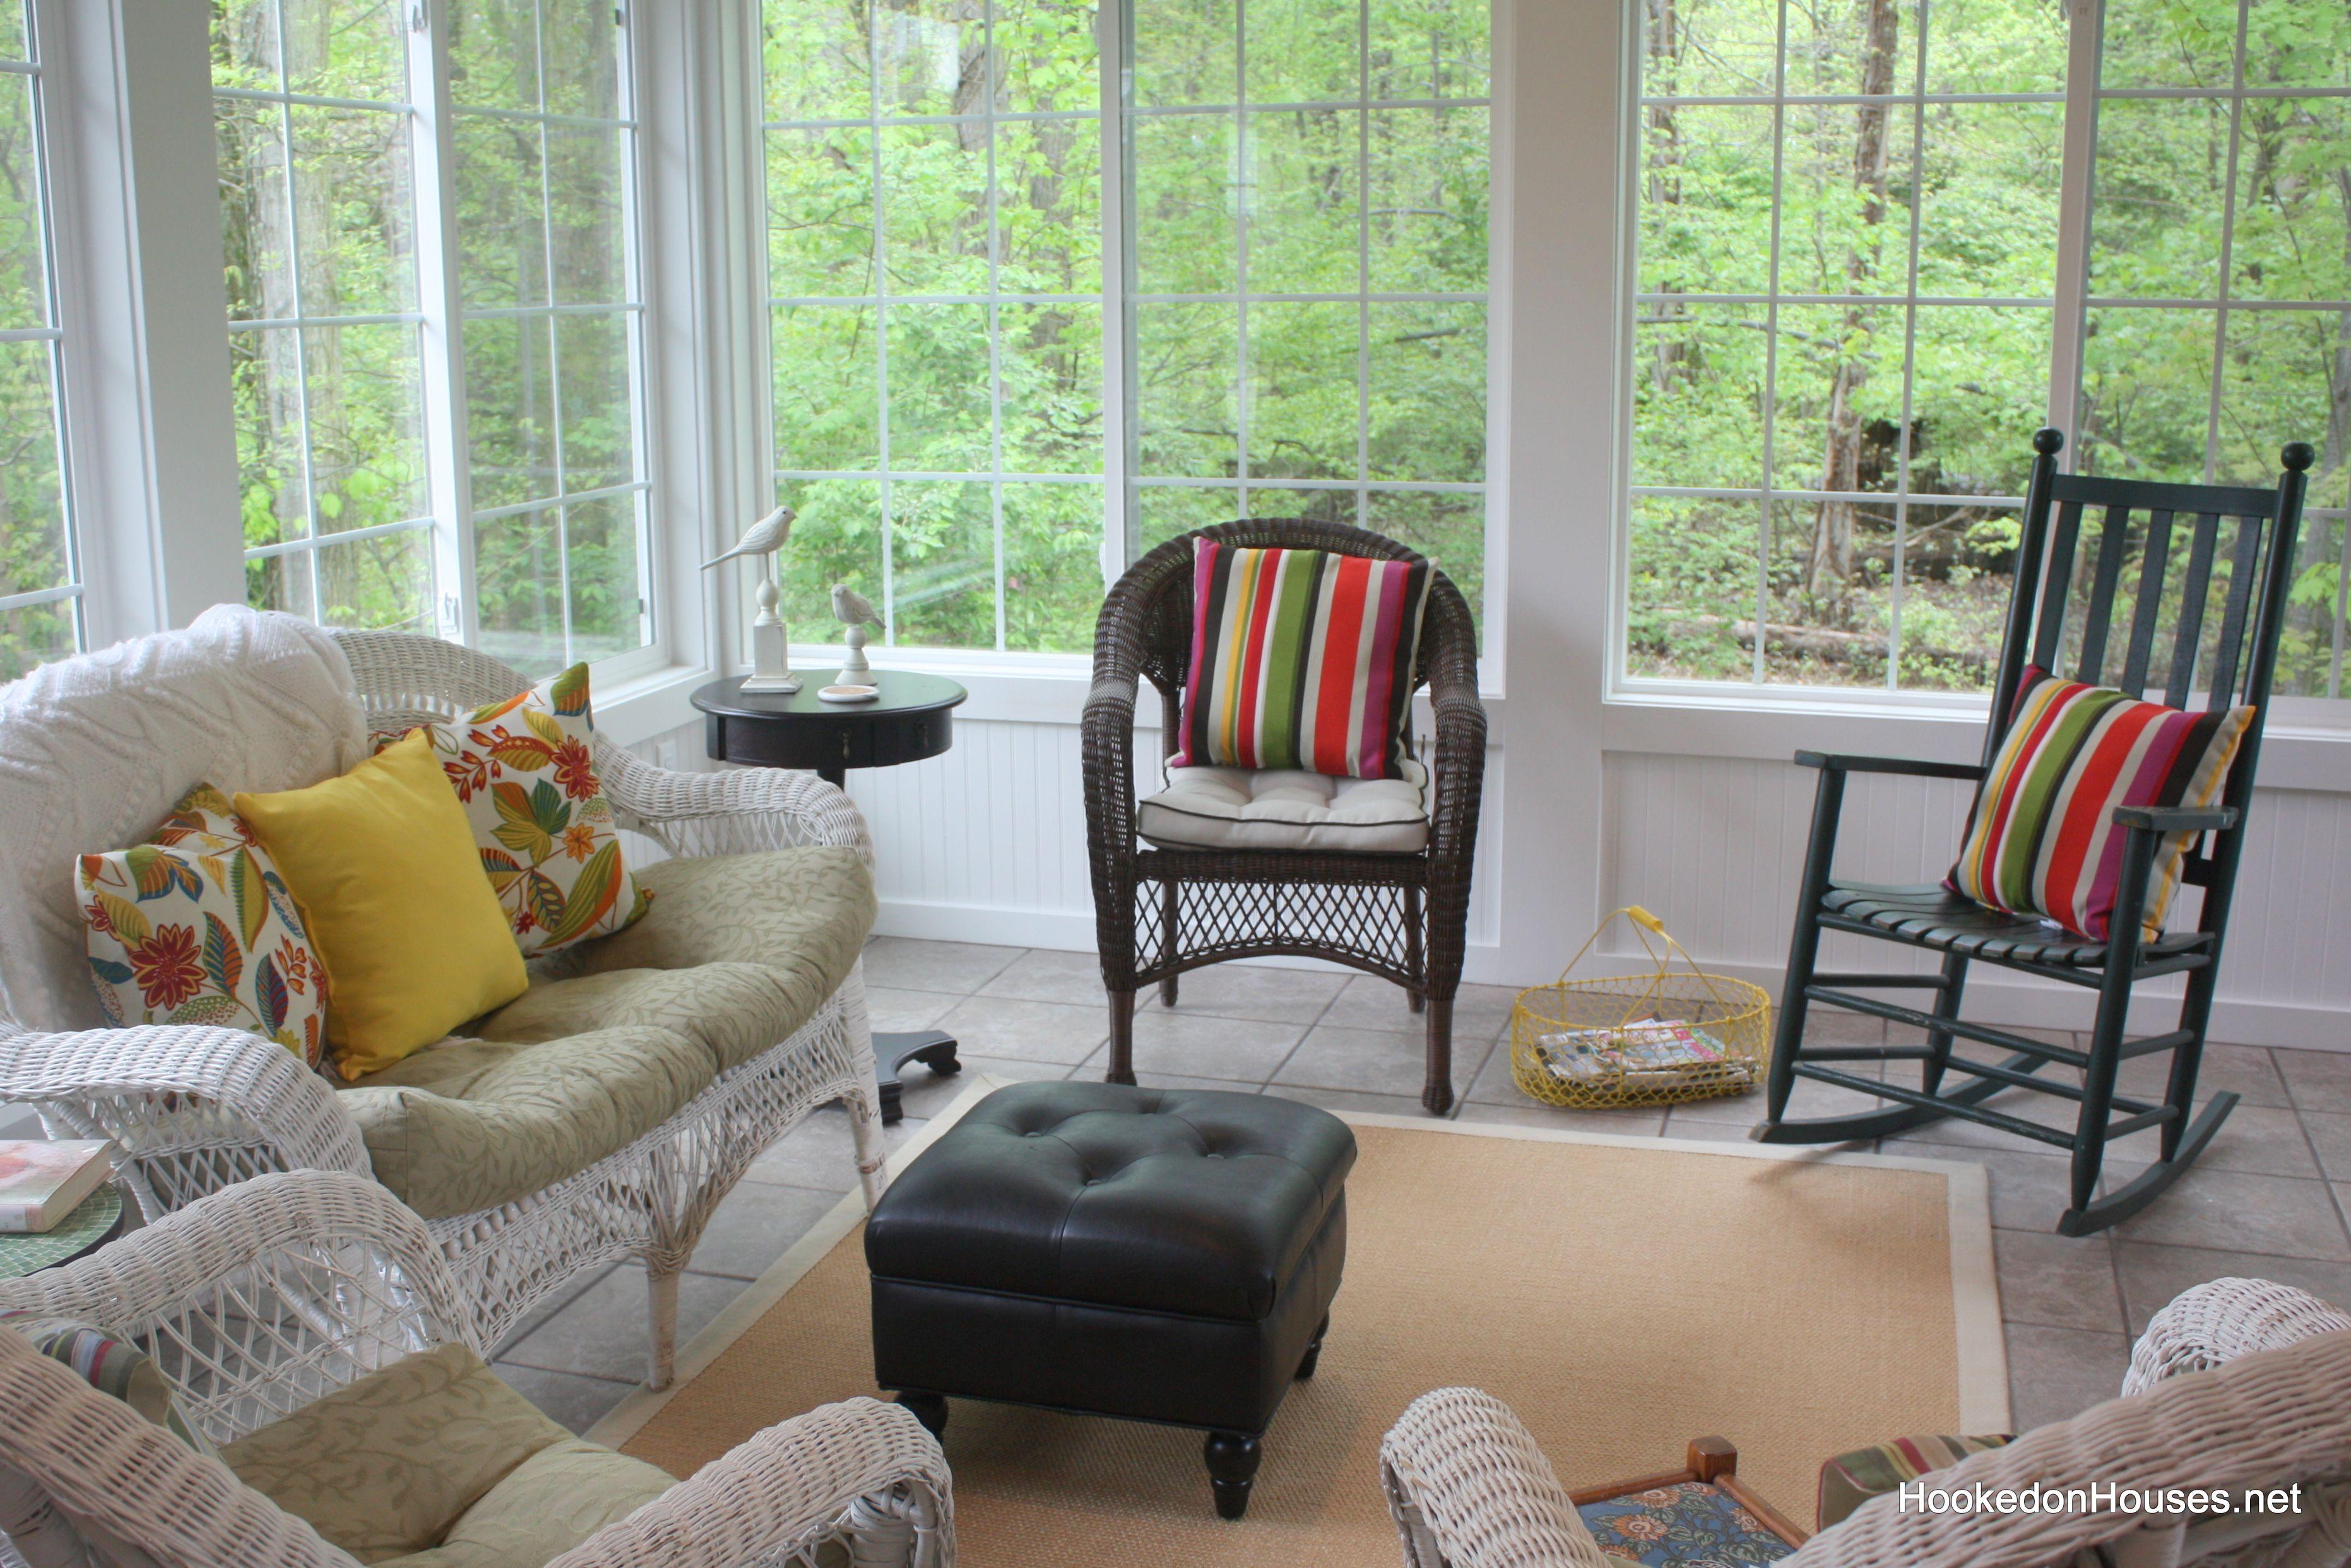 Captivating Explore Sunroom Ideas, Porch Ideas, And More!